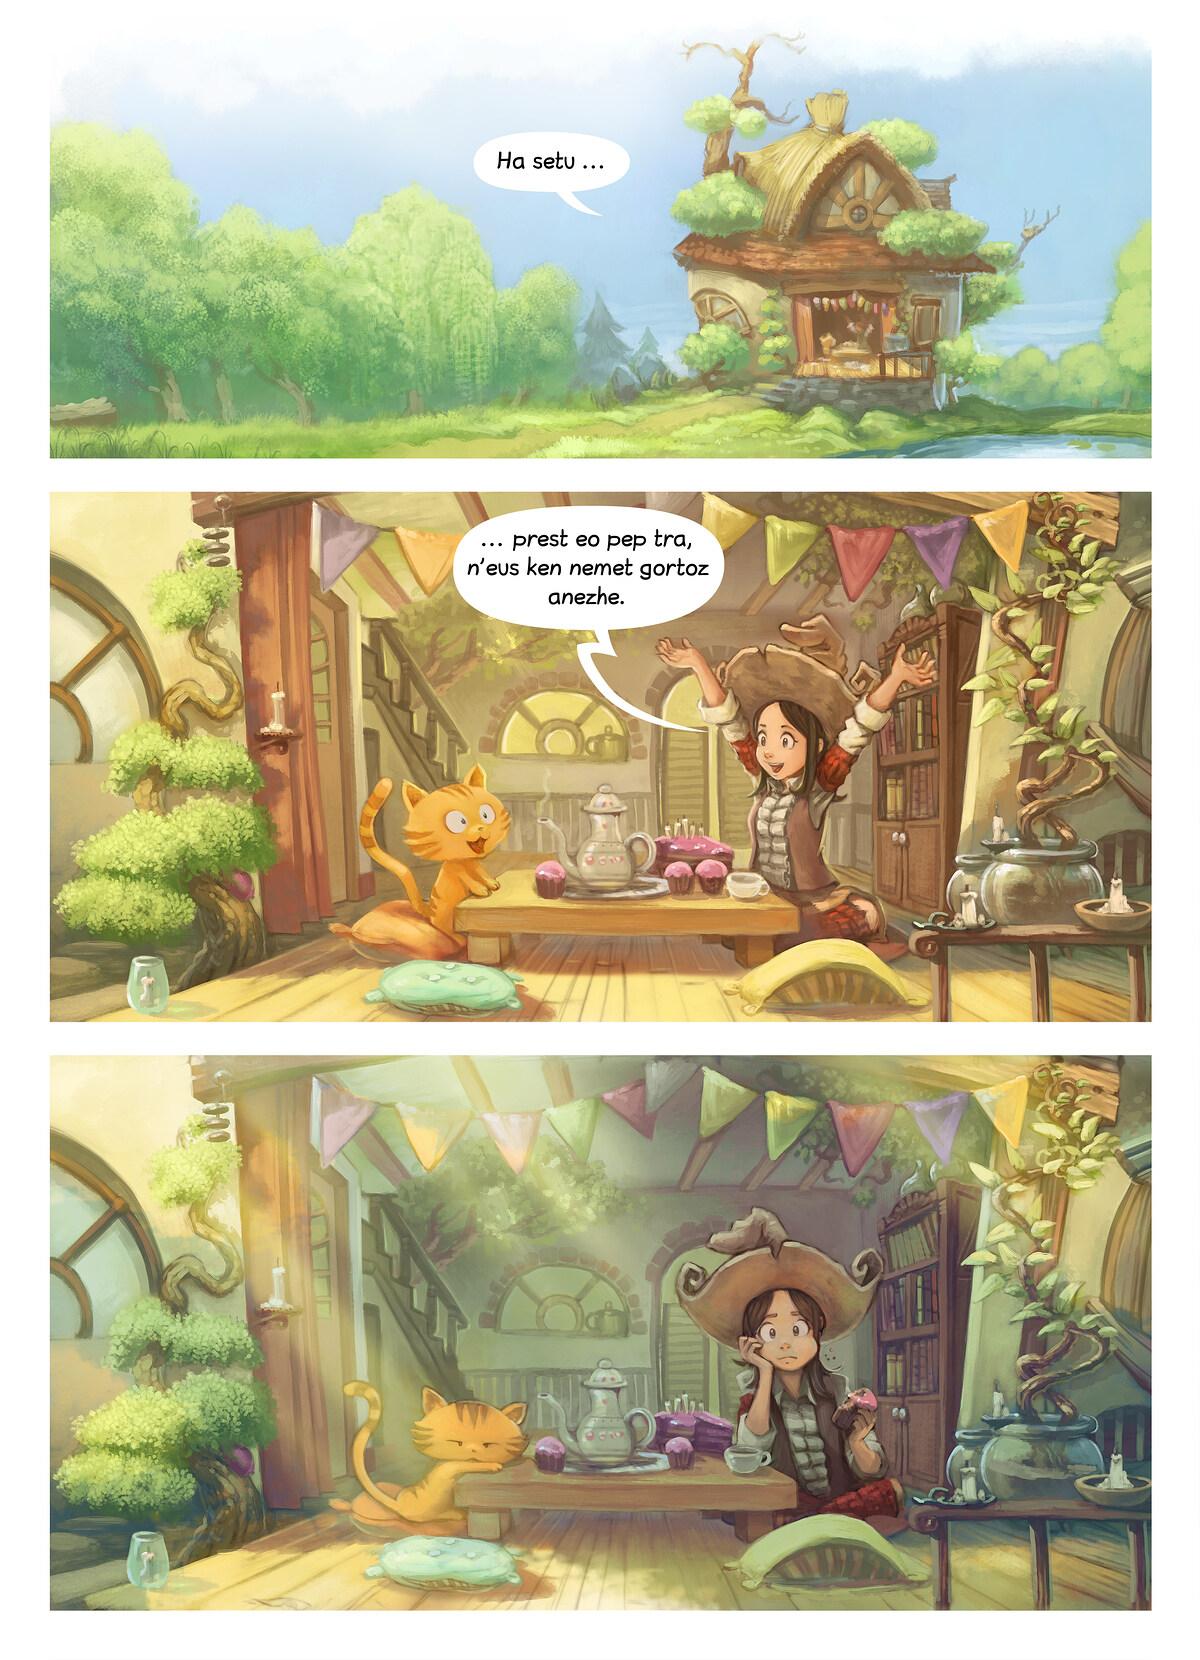 A webcomic page of Pepper&Carrot, rann 8 [br], pajenn 3